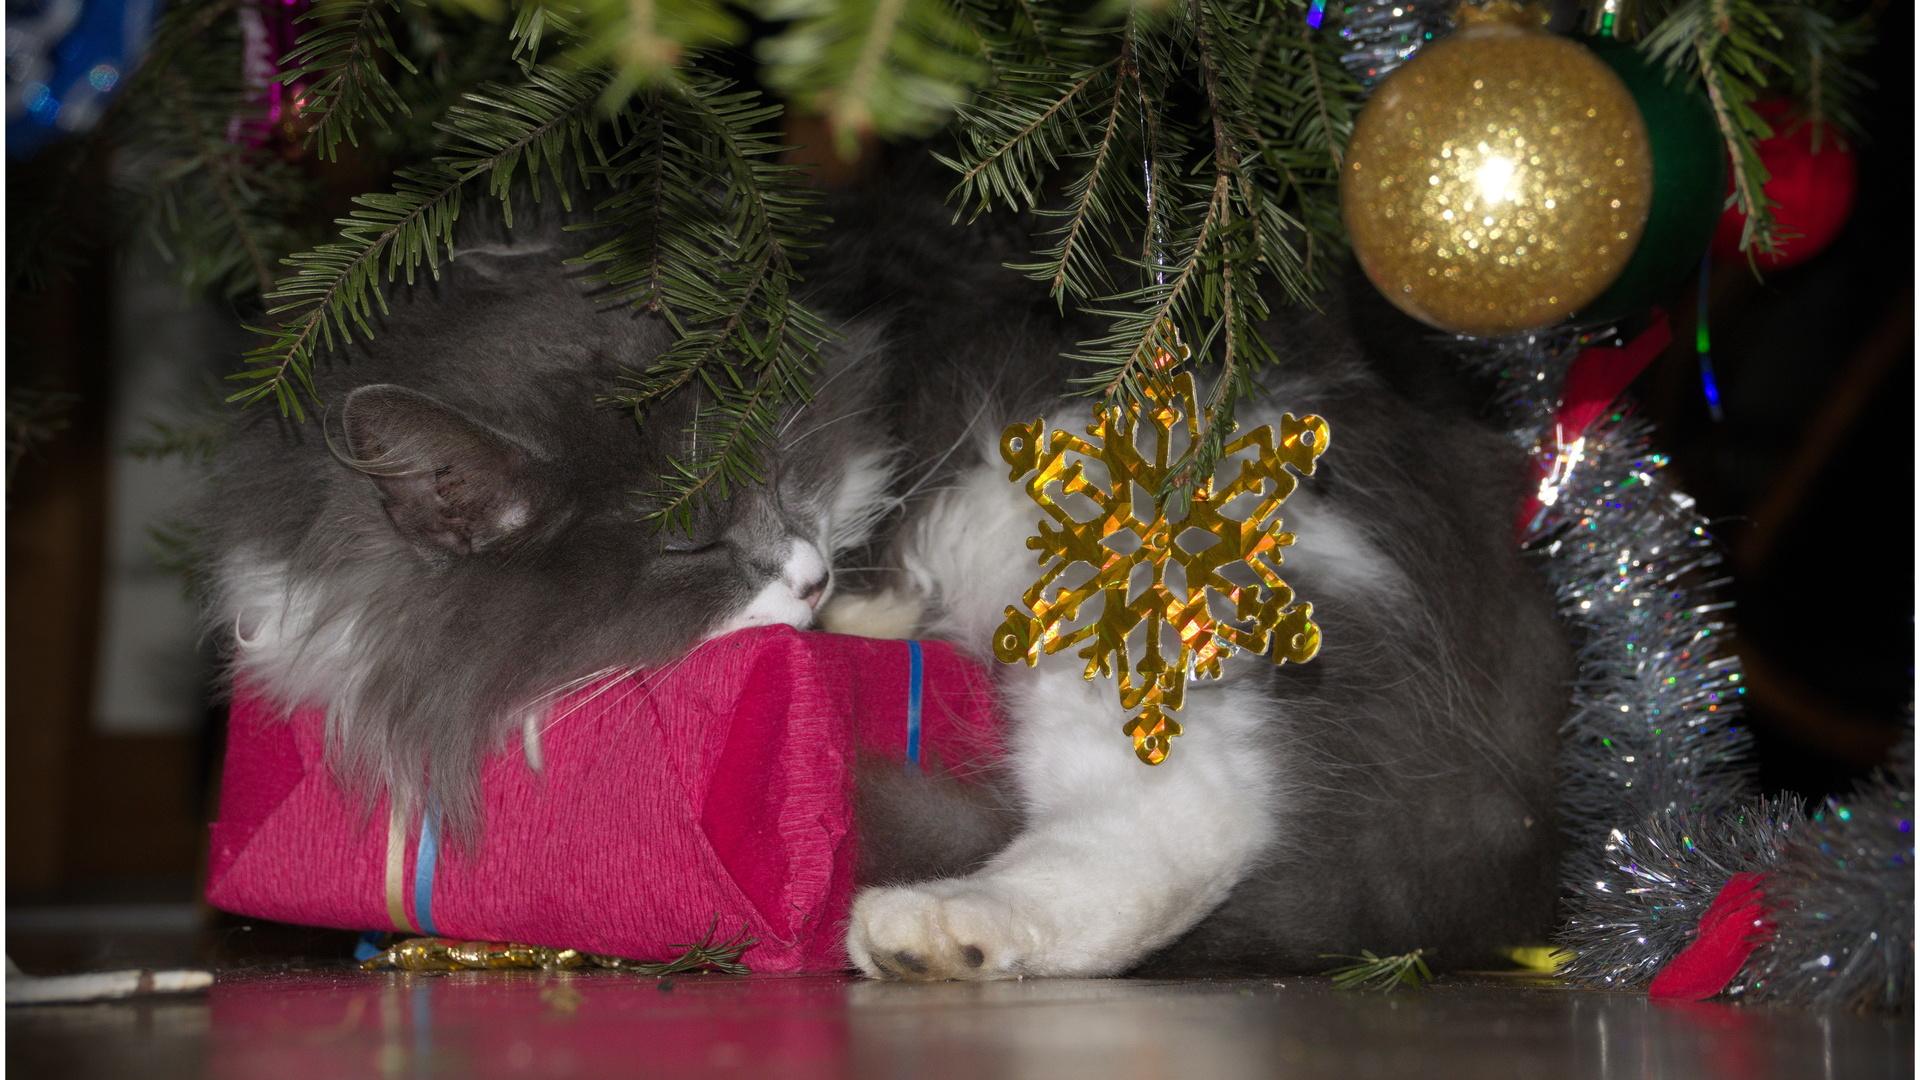 кот шурик, после нового года